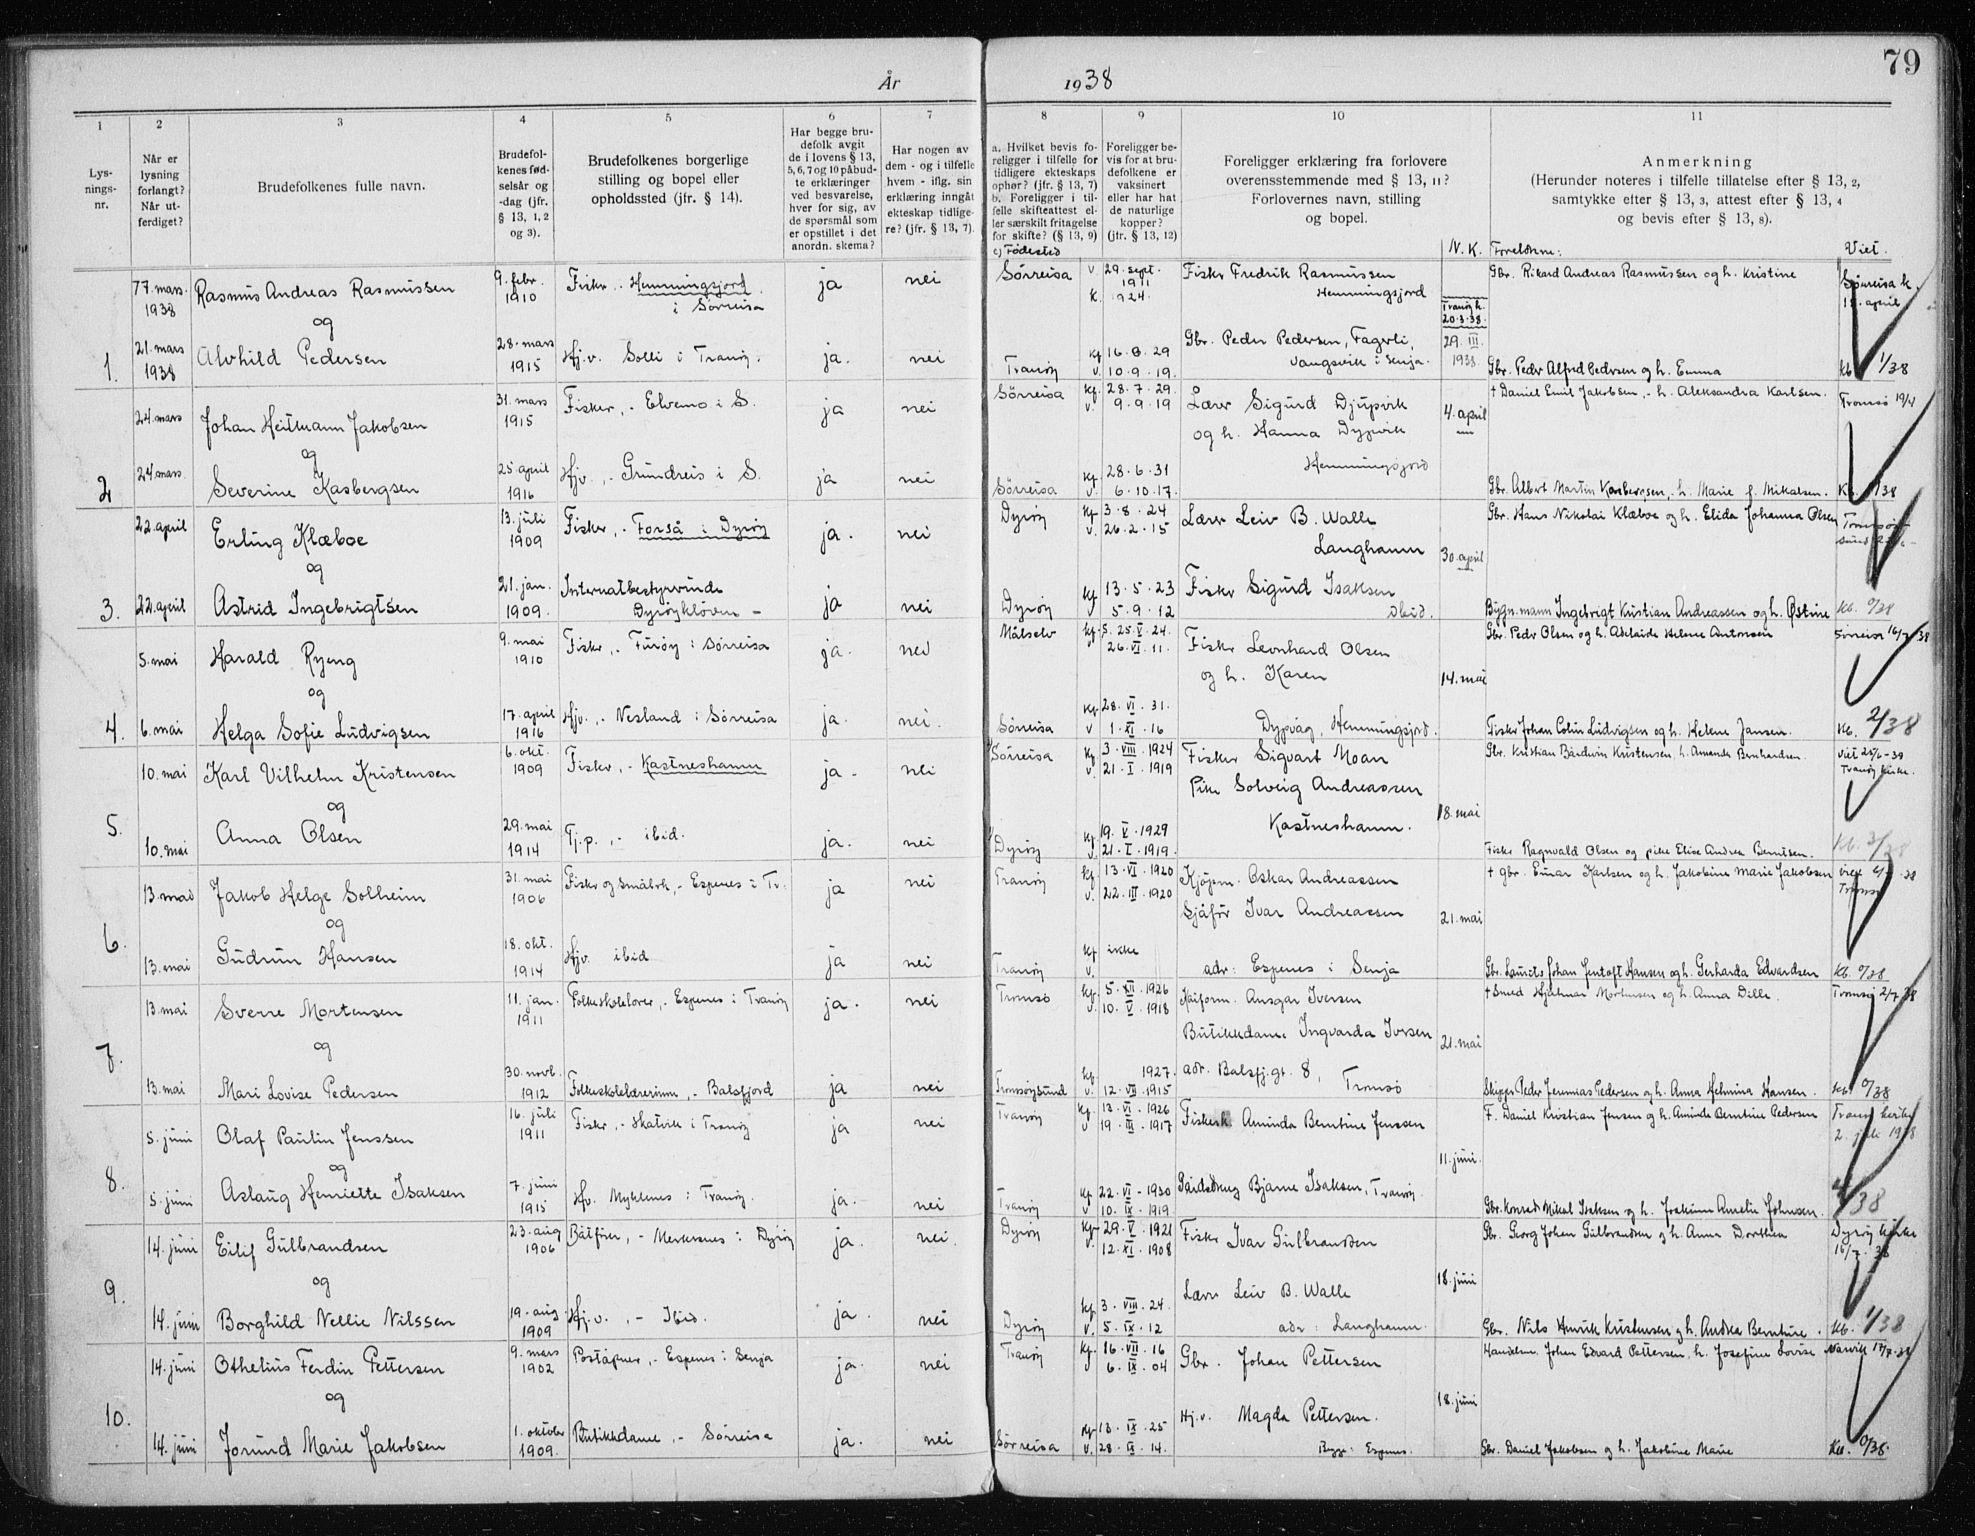 SATØ, Tranøy sokneprestkontor, J/Jc/L0053: Lysningsprotokoll nr. 53, 1919-1940, s. 79